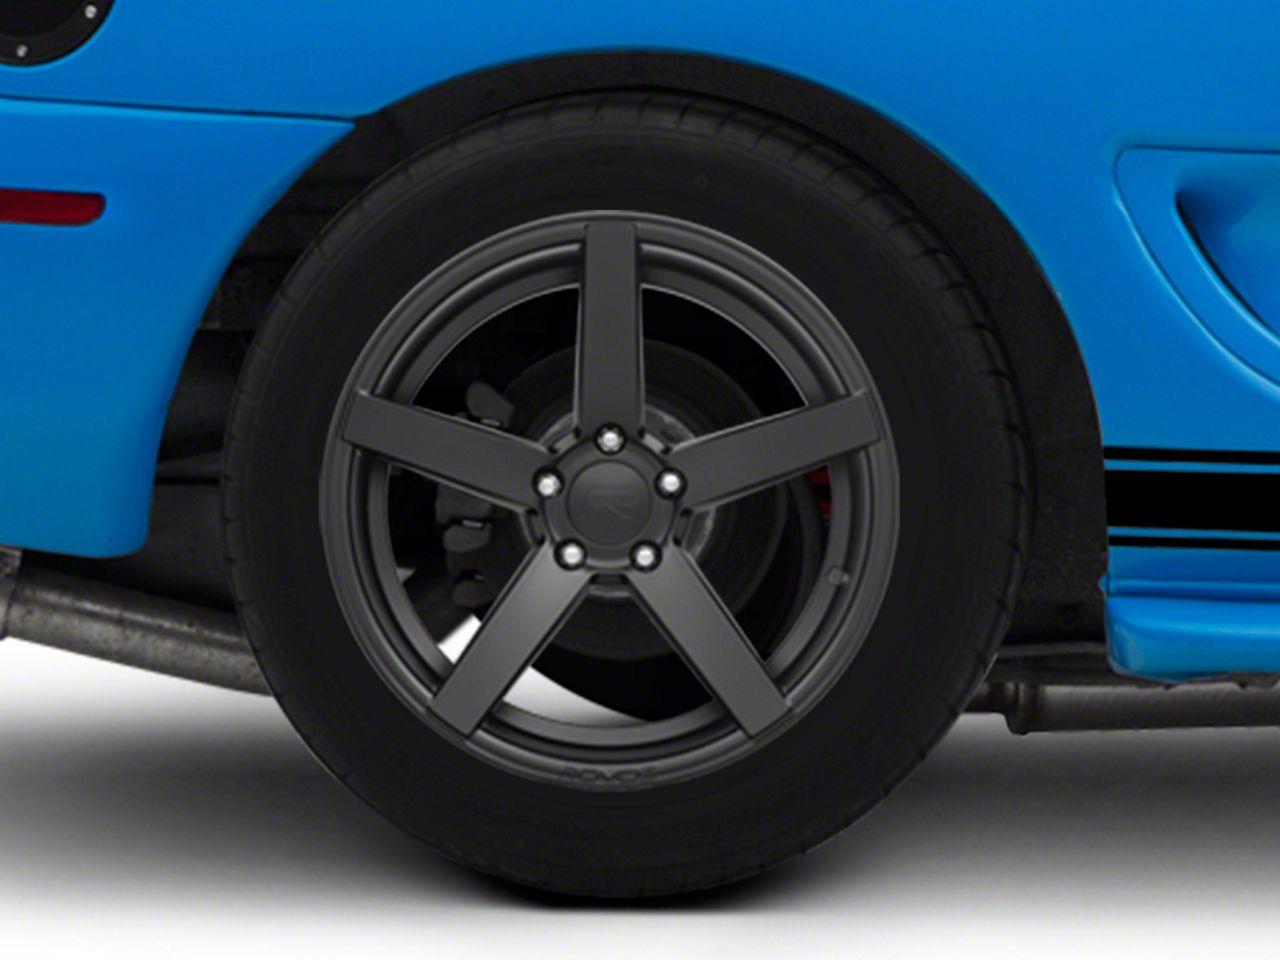 Rovos Durban Satin Black Wheel - 18x10.5 - Rear Only (94-04 All)